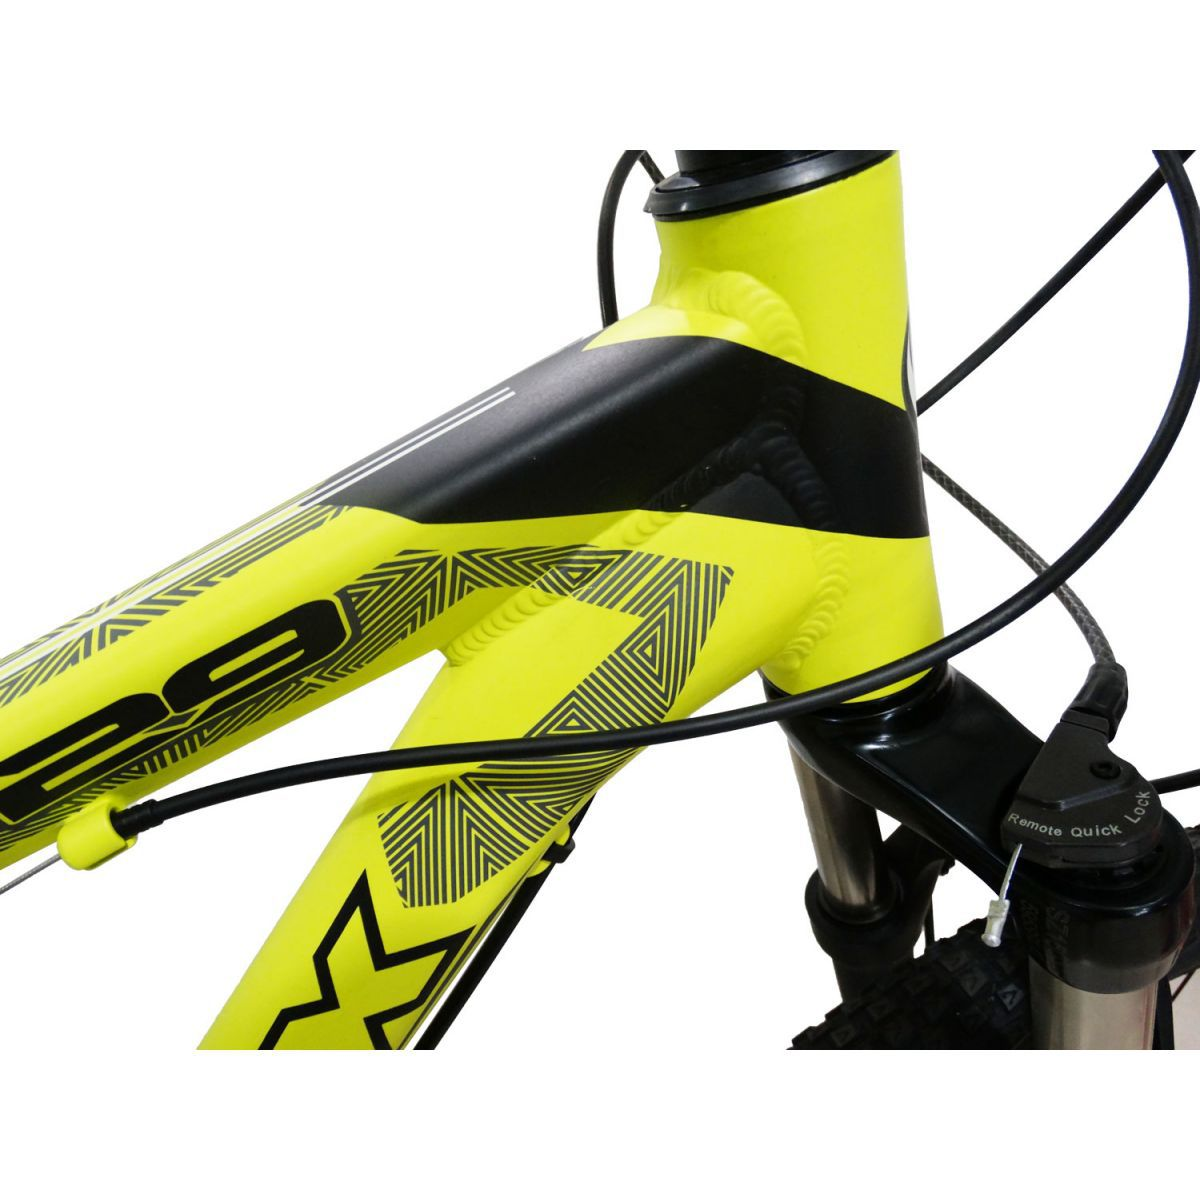 Bicicleta VIKINGX Ultra aro 29 - 27v Shimano Acera - Freio Shimano Hidráulico